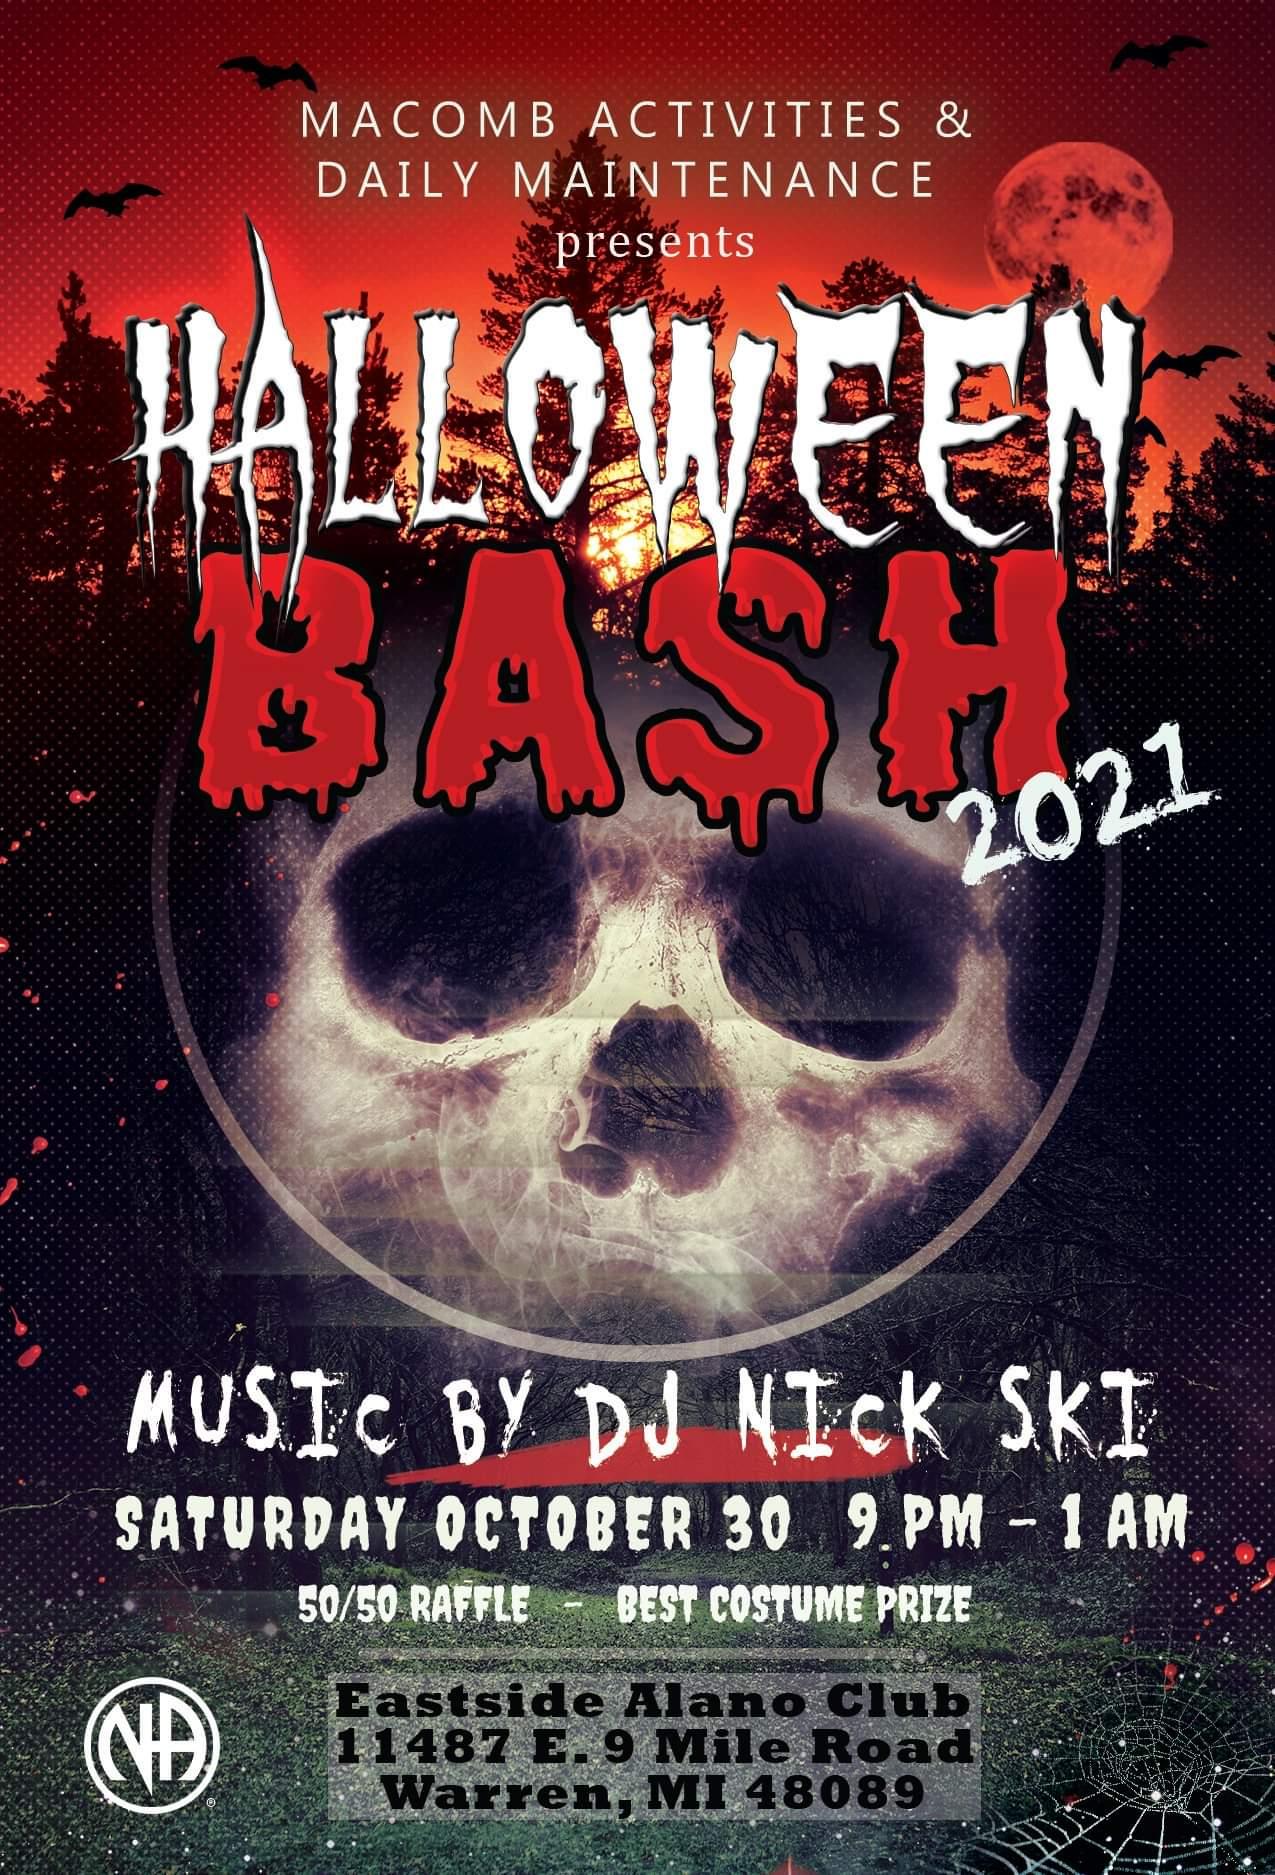 Halloween Bash @ Eastside Alano Club | Warren | Michigan | United States